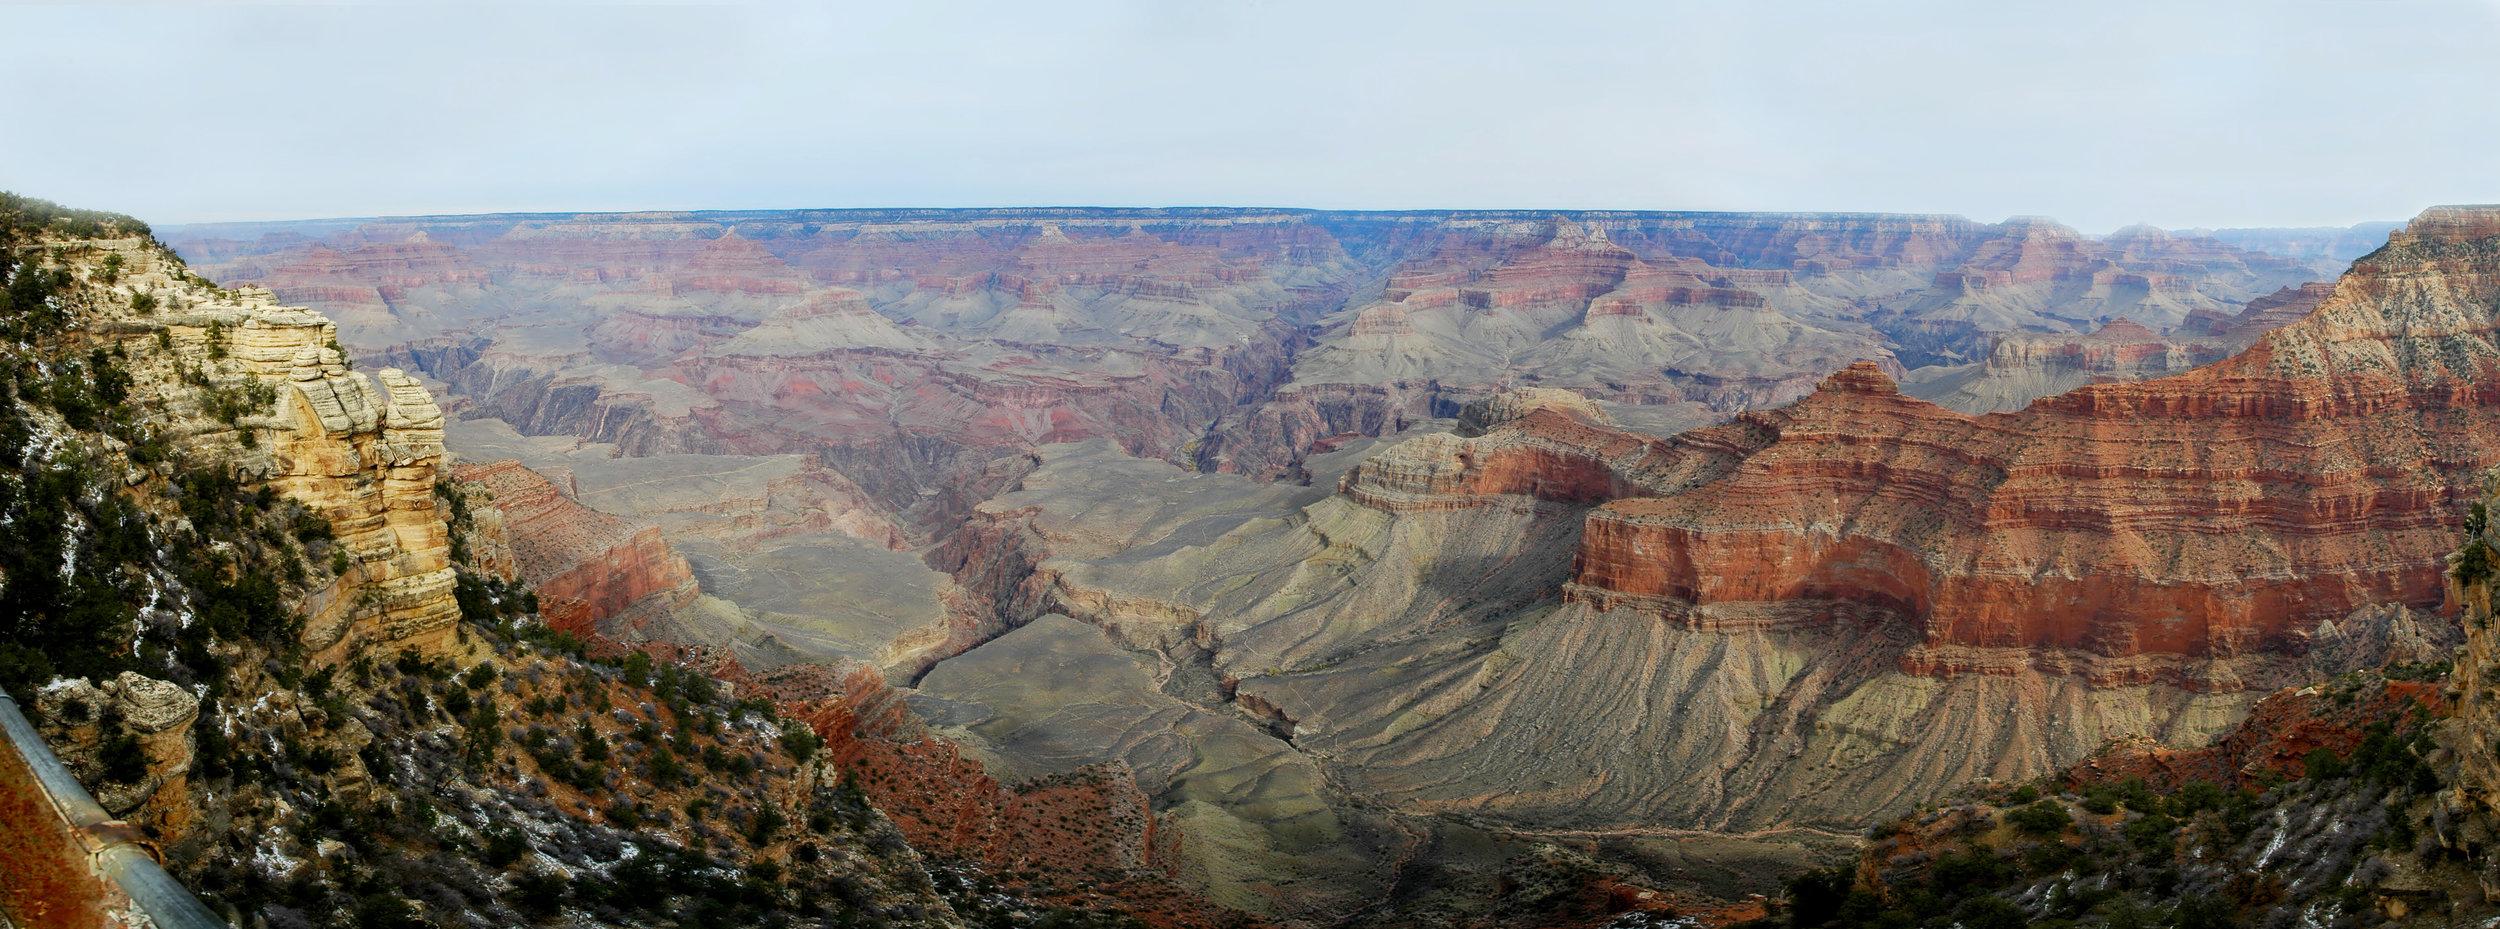 857266_95197305 Arizona Grand Canyon.jpg